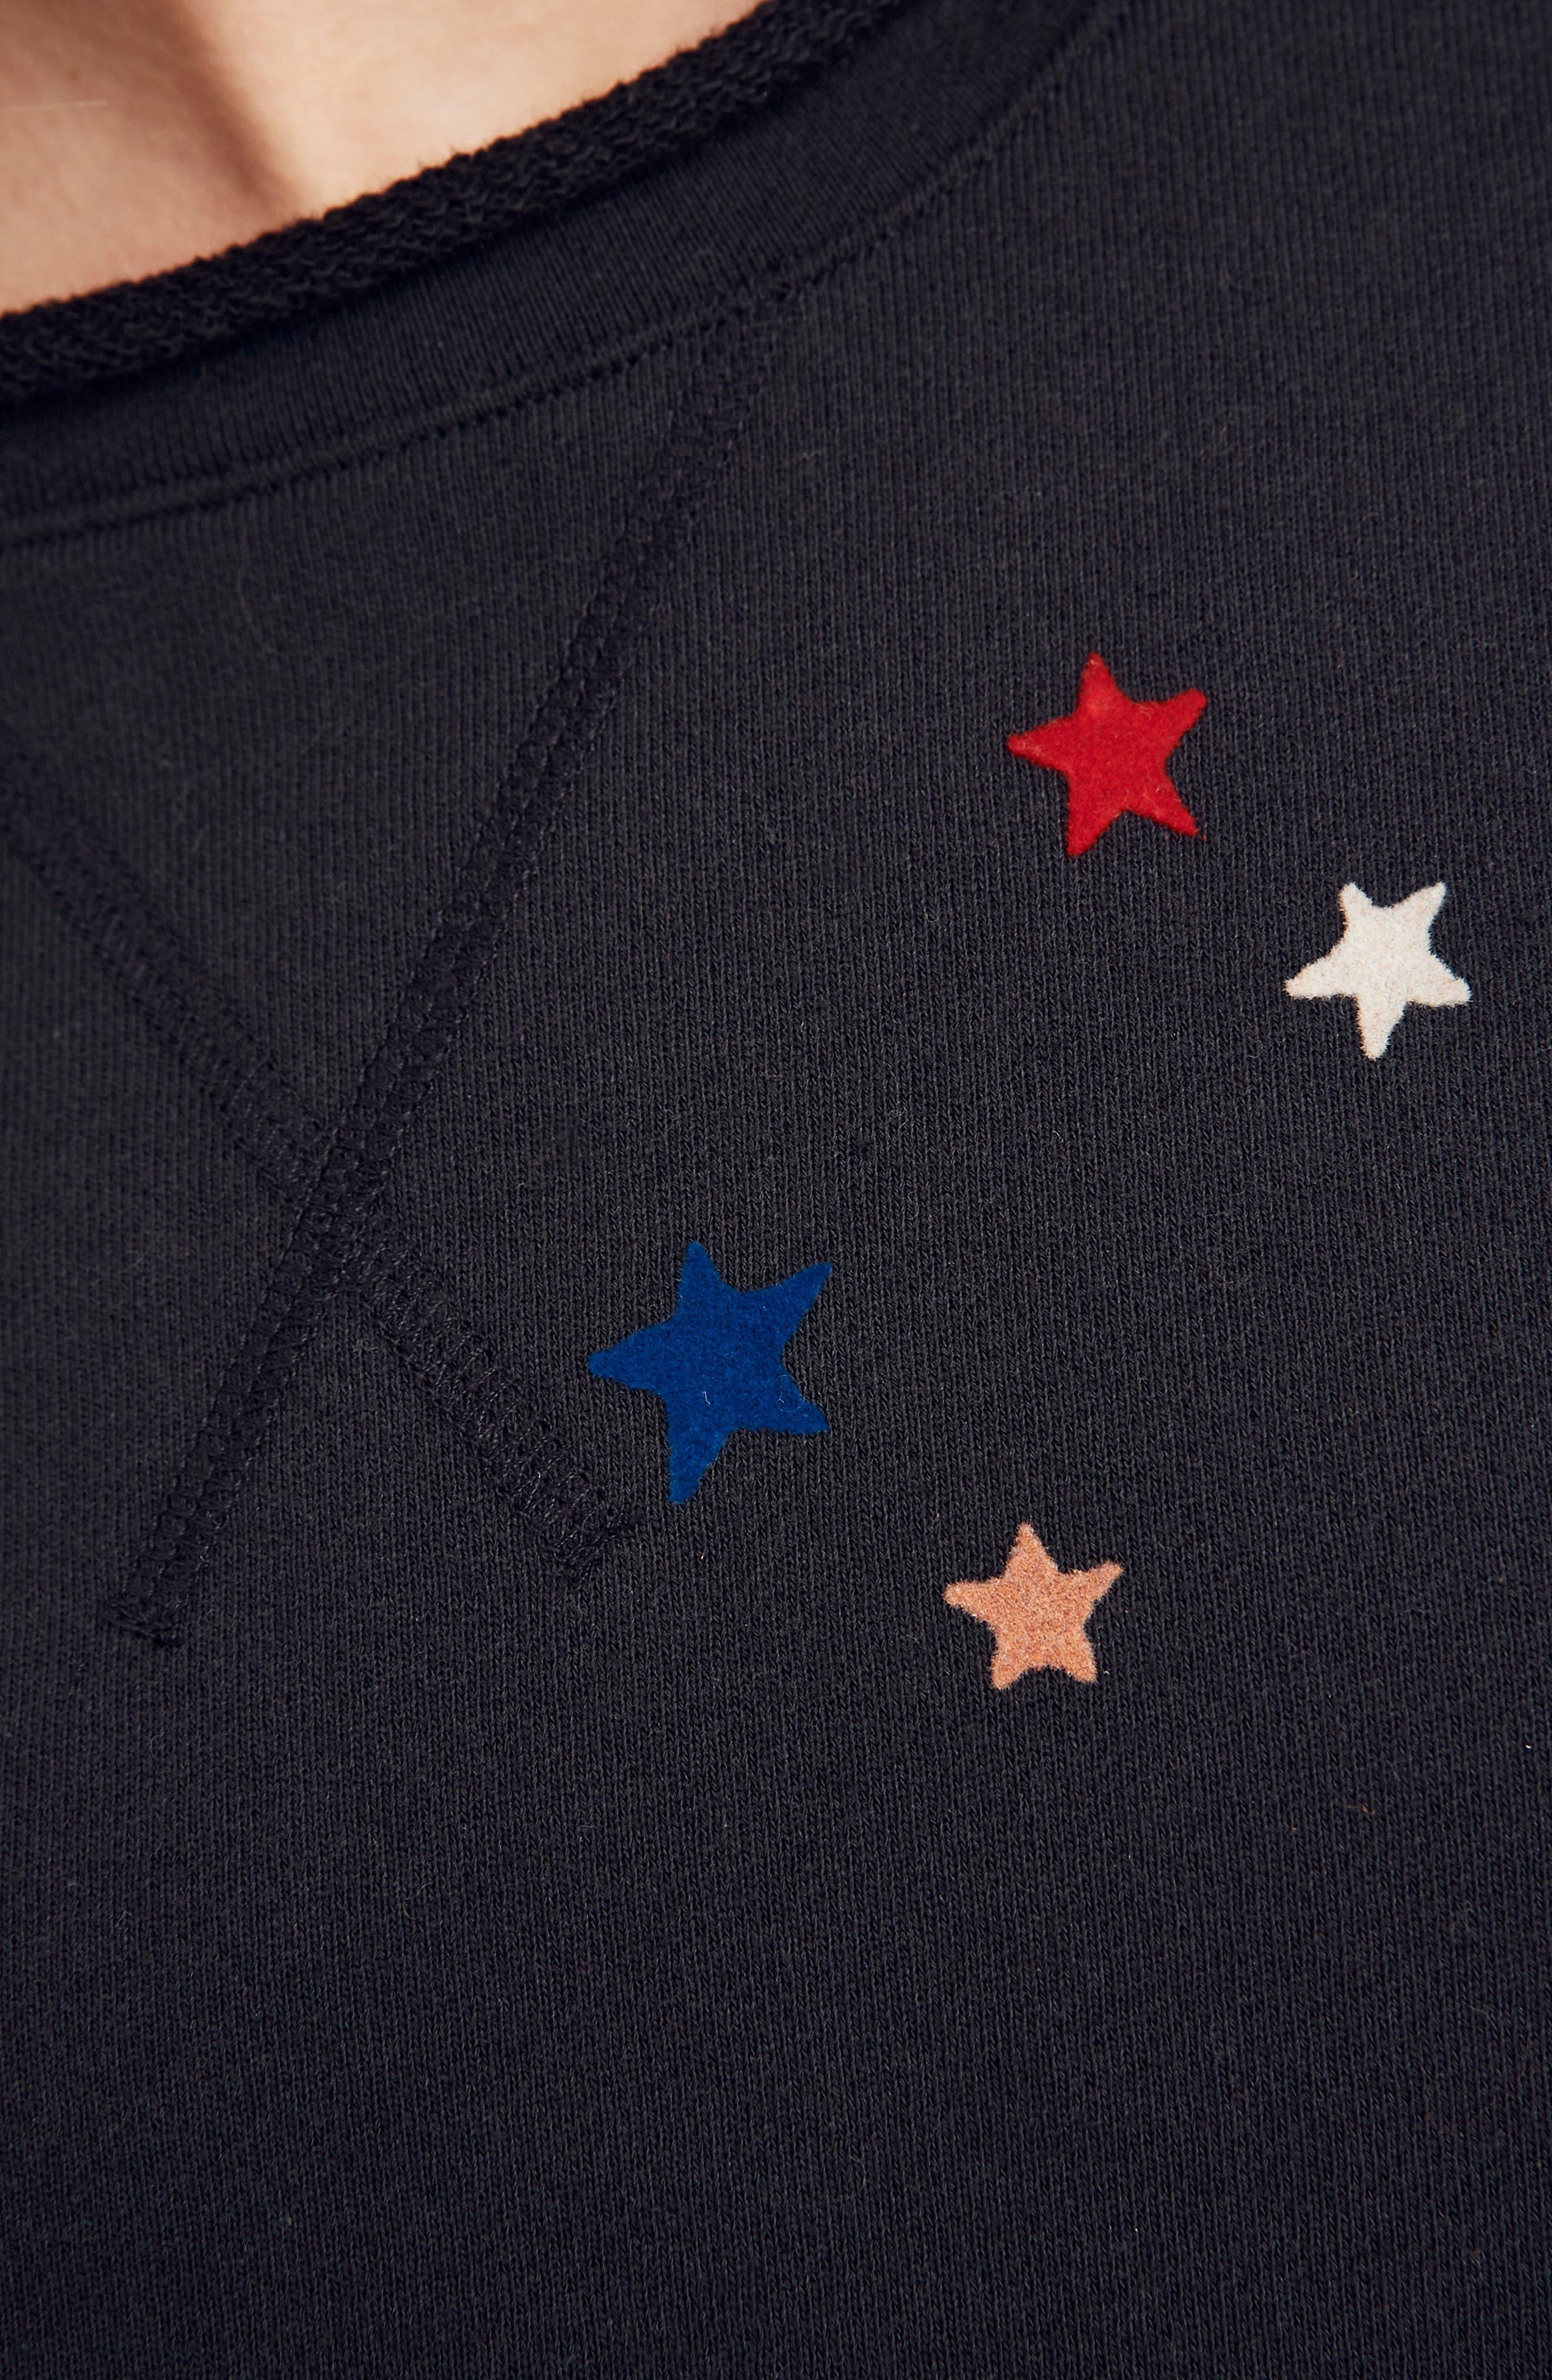 Starry Night Sweatshirt,                             Alternate thumbnail 5, color,                             009